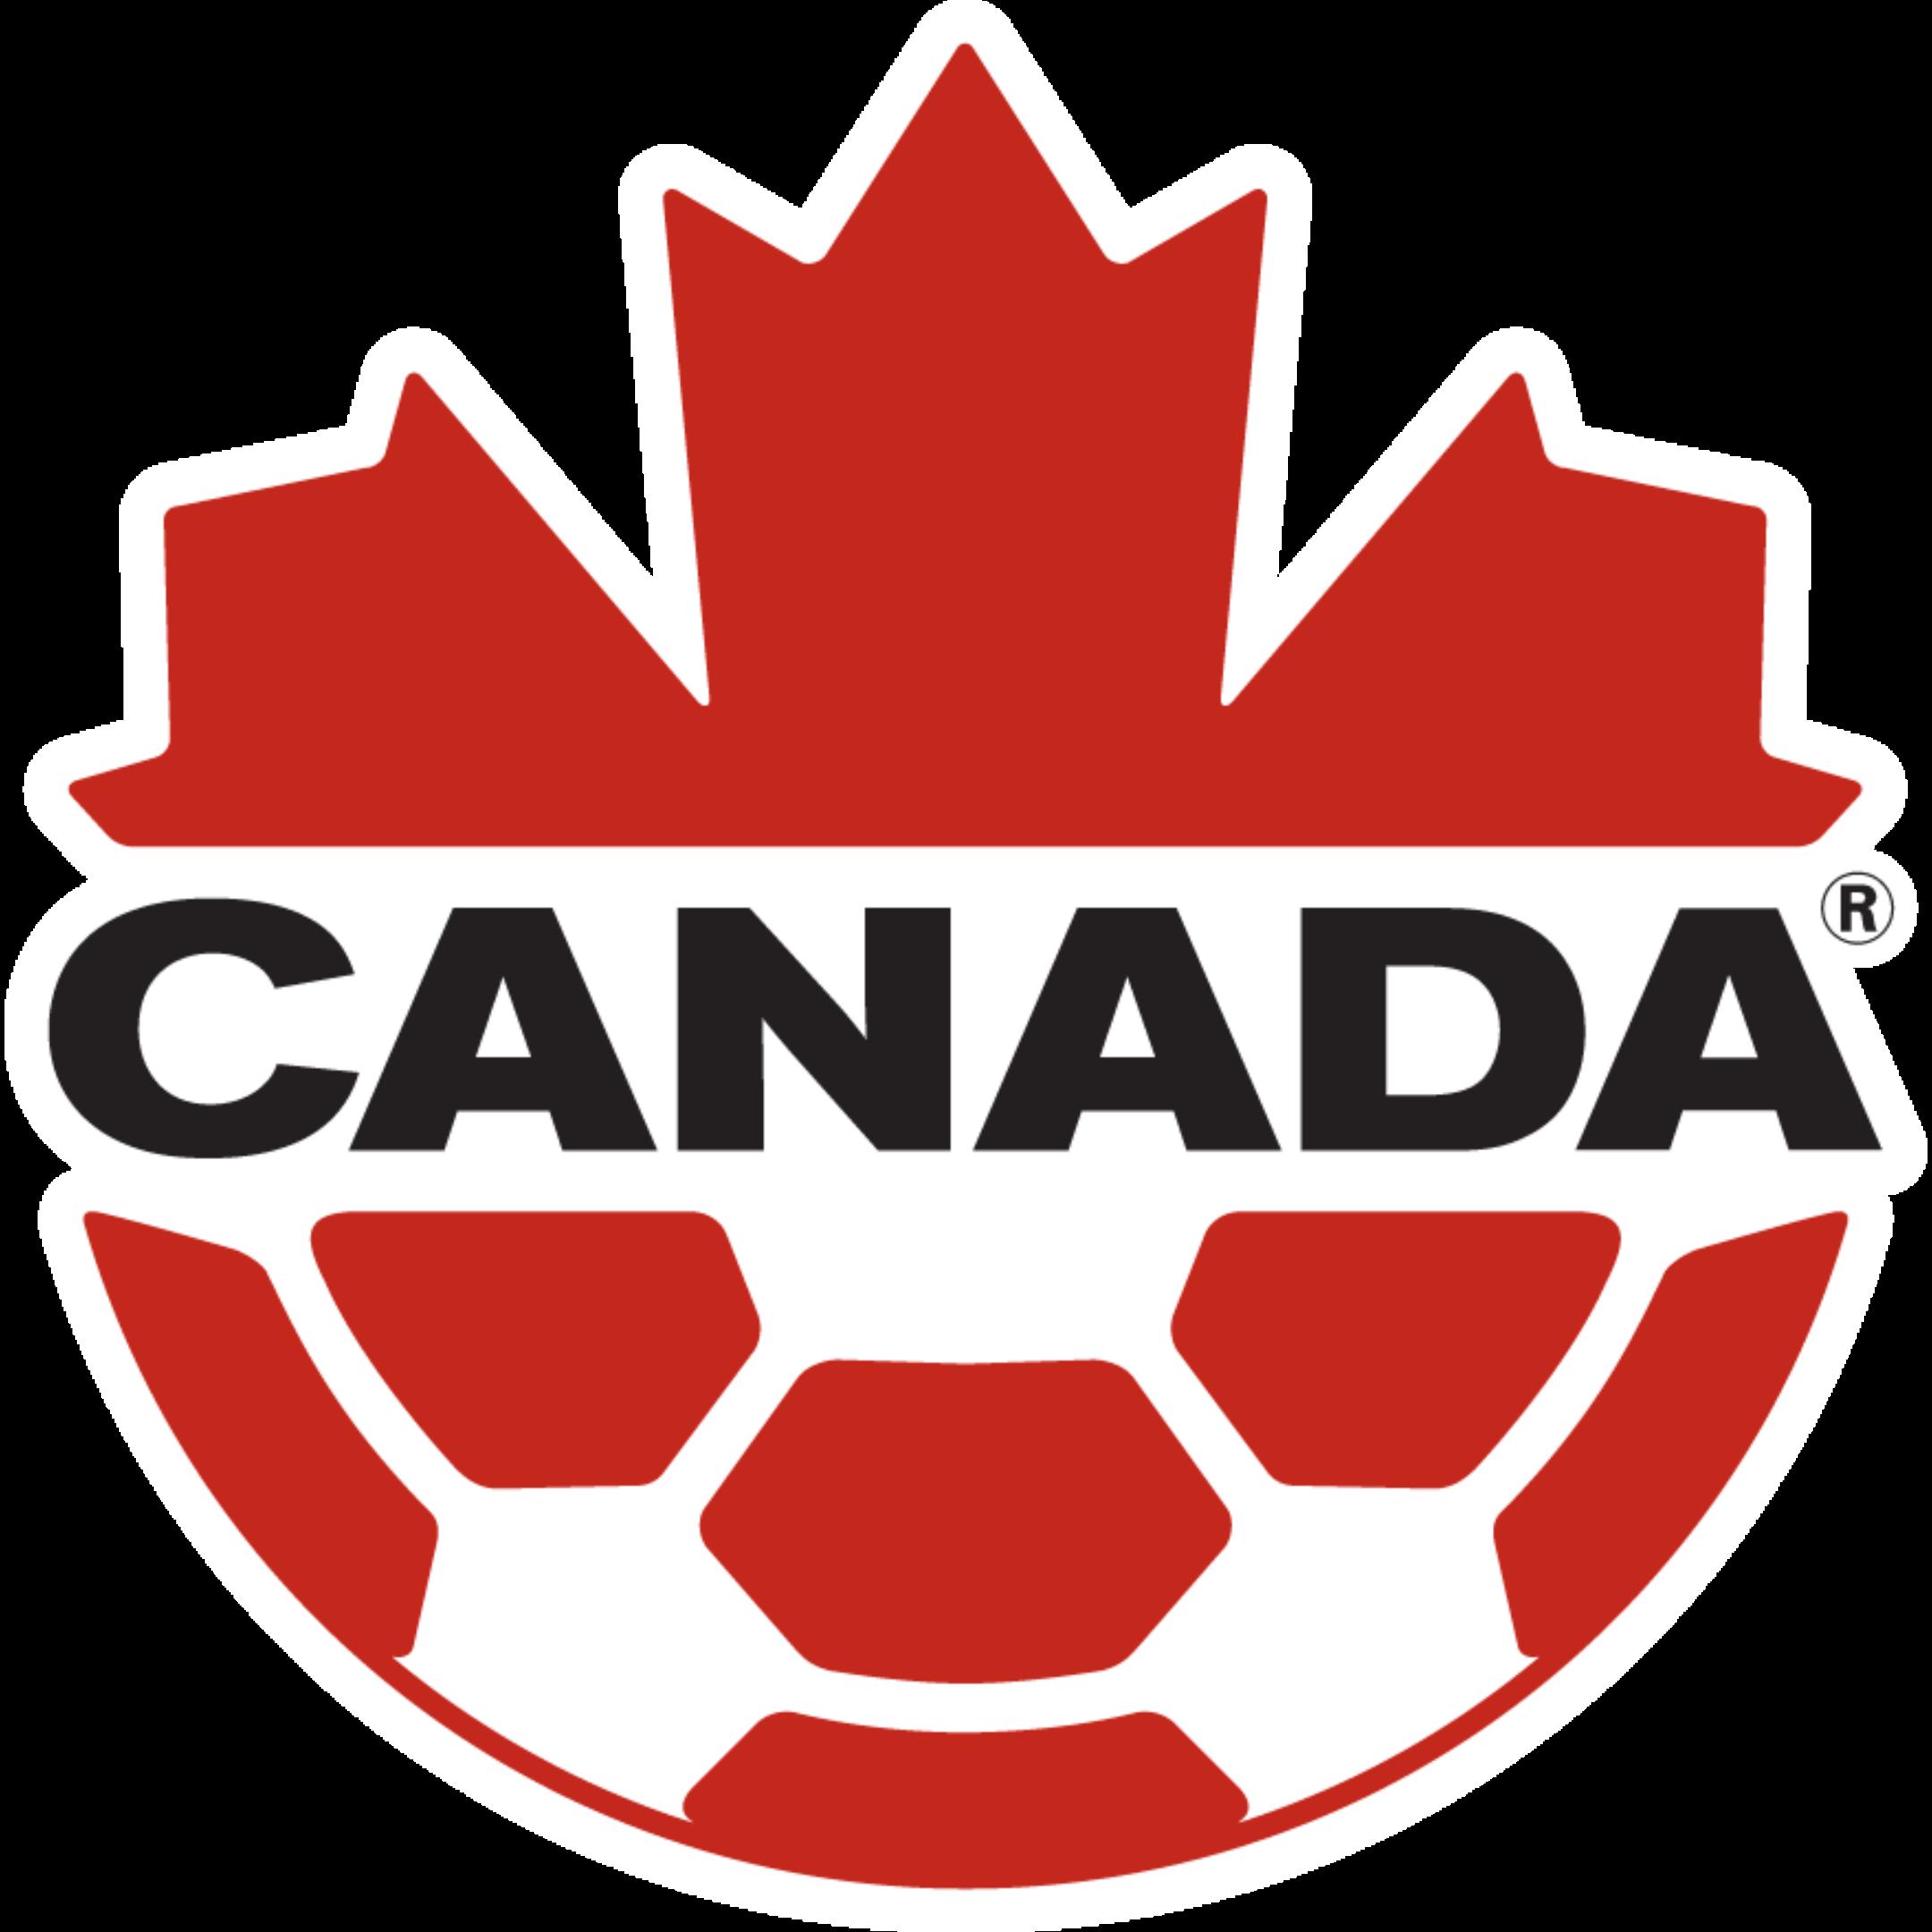 canada soccer team logo 1 - Canada Soccer Logo